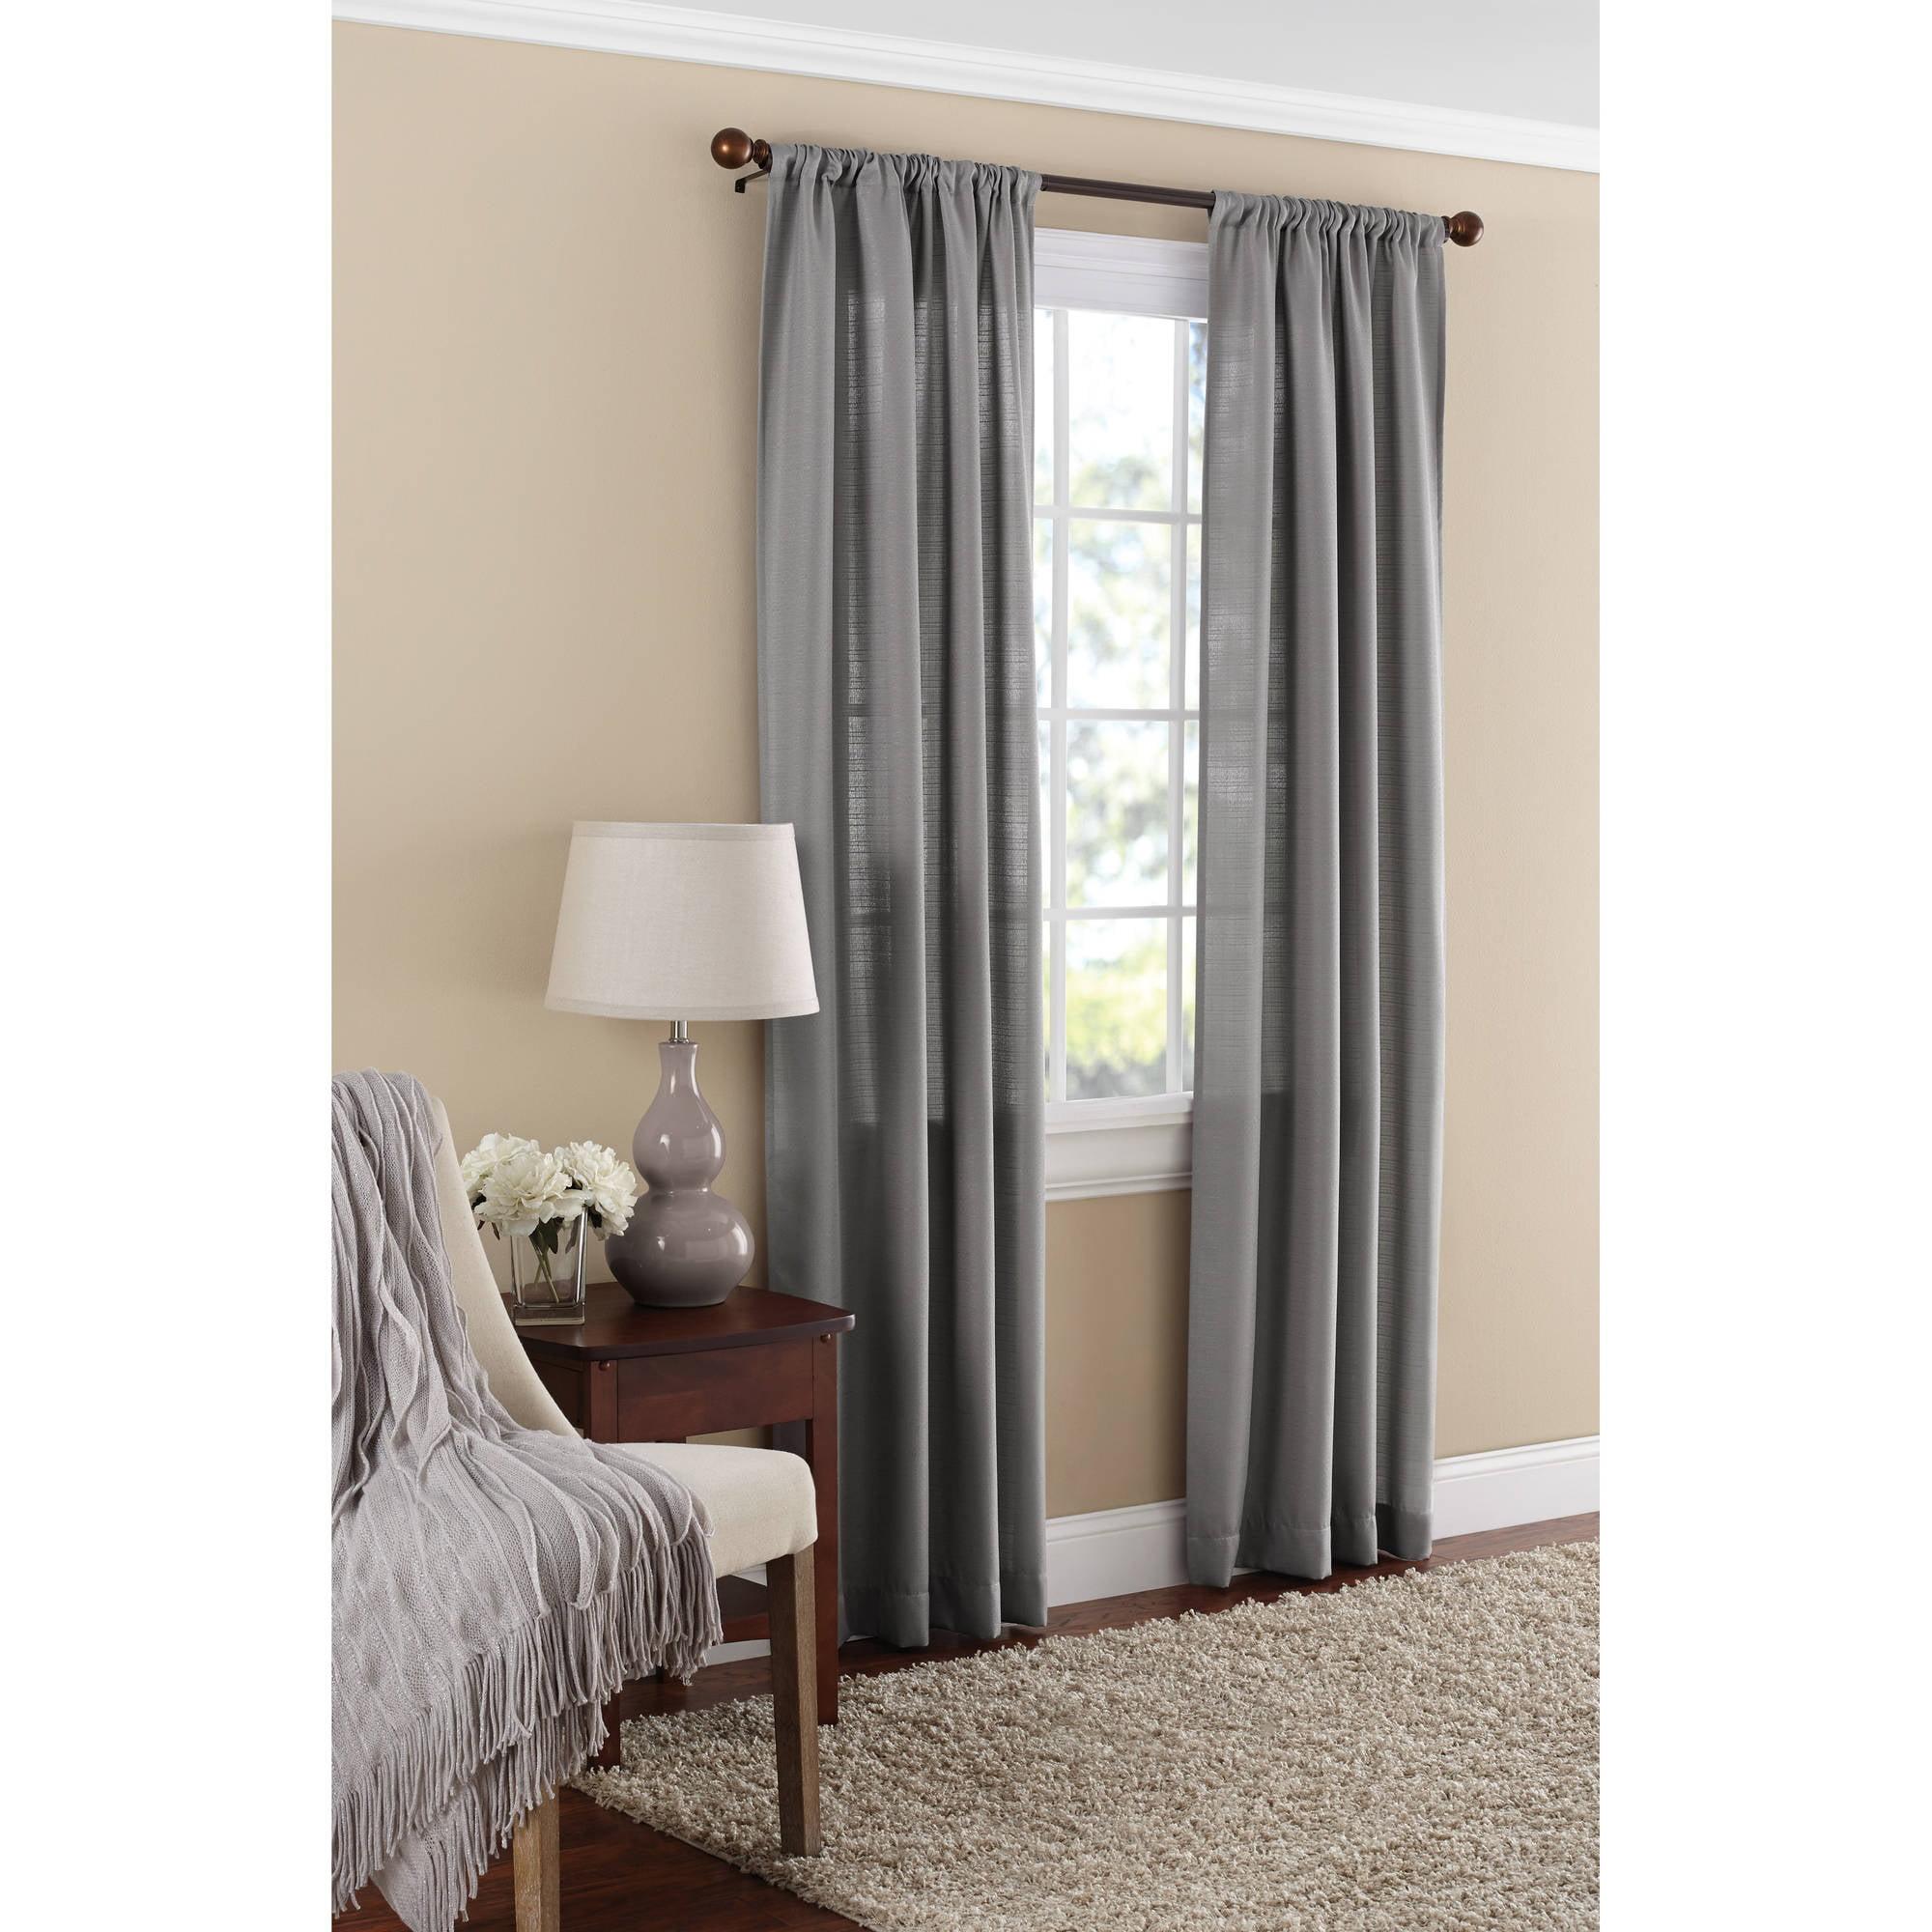 Attractive Mainstays Textured Solid Curtain Panel   Walmart.com